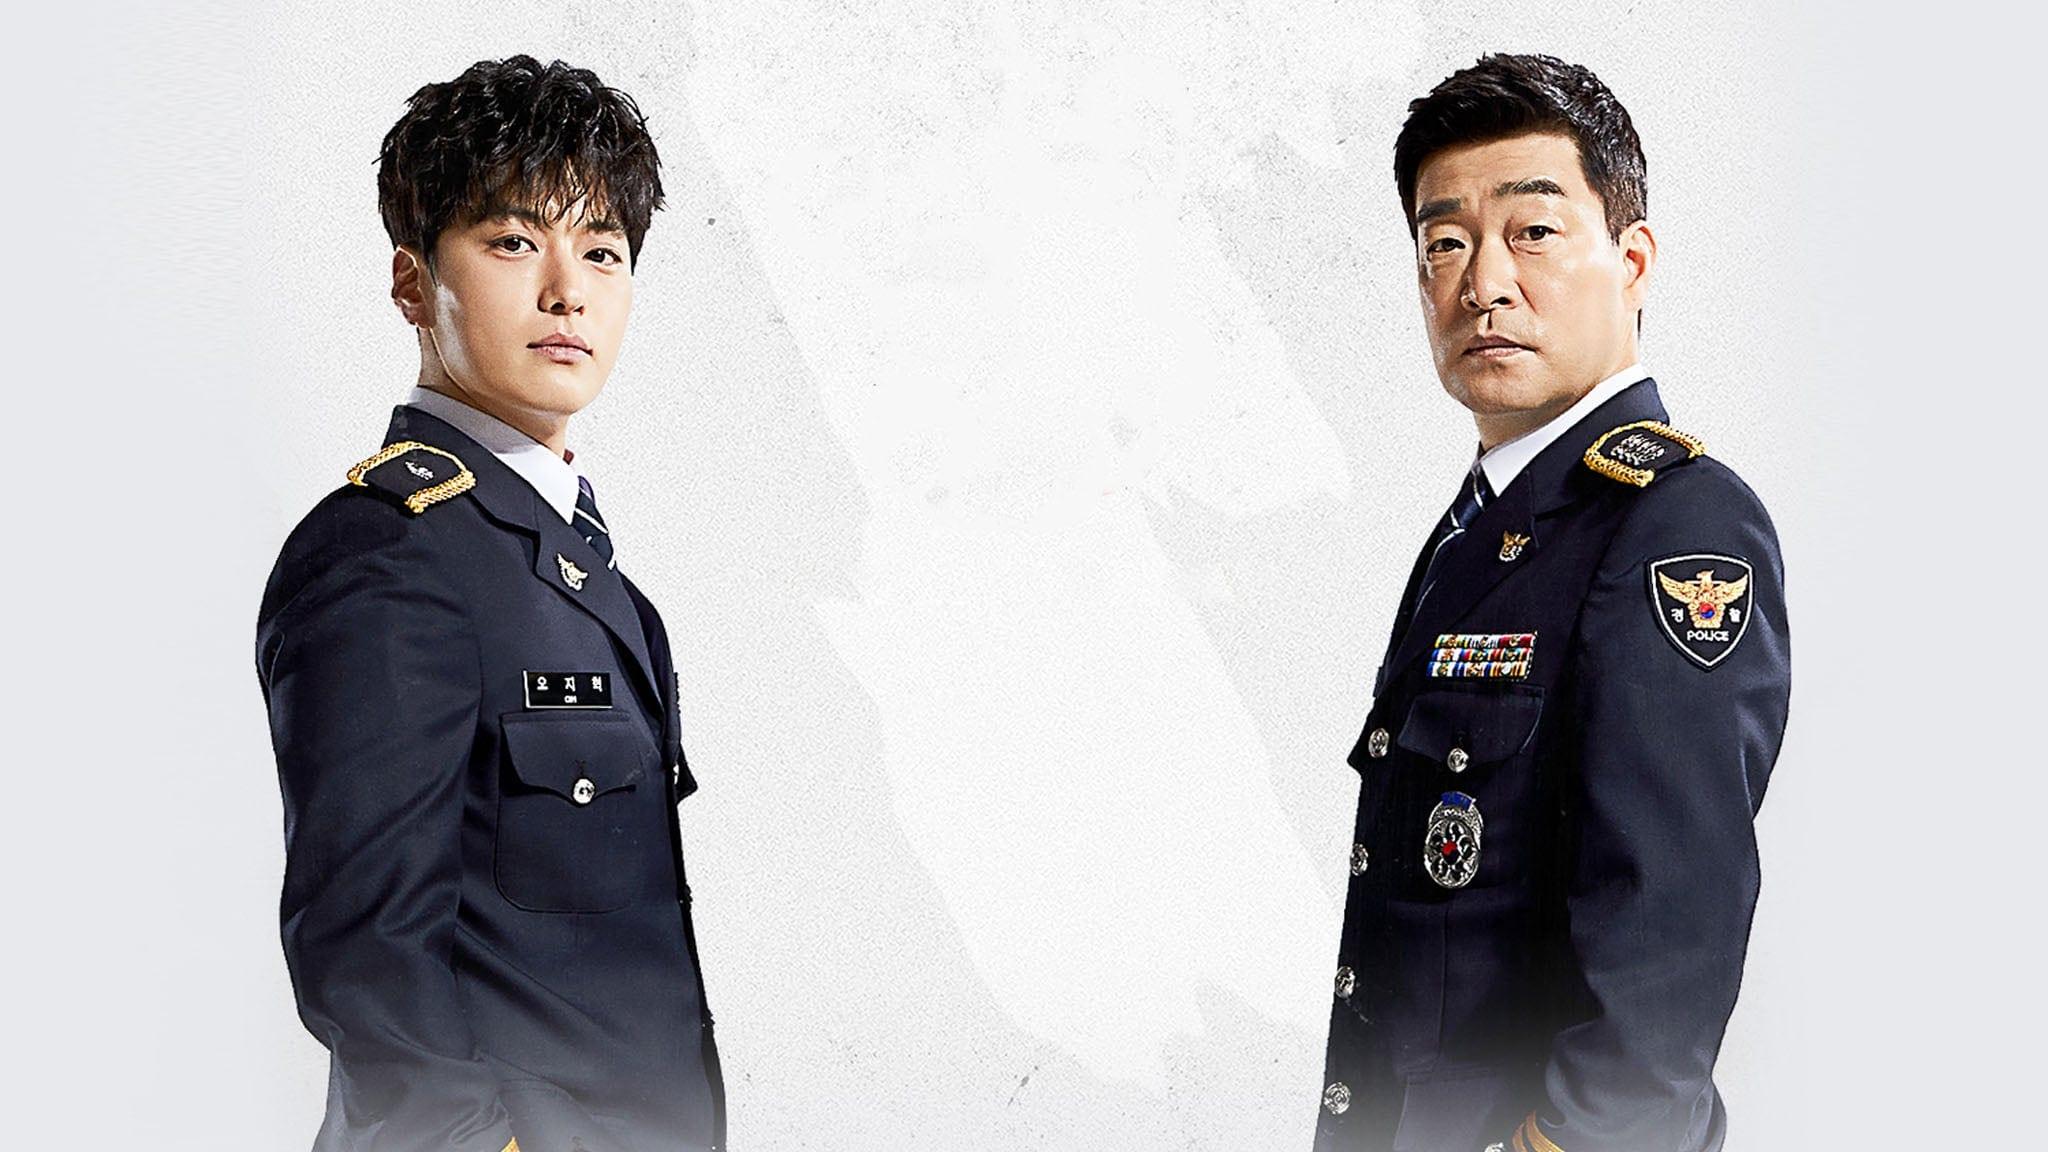 The Good Detective Season 2 Release Date